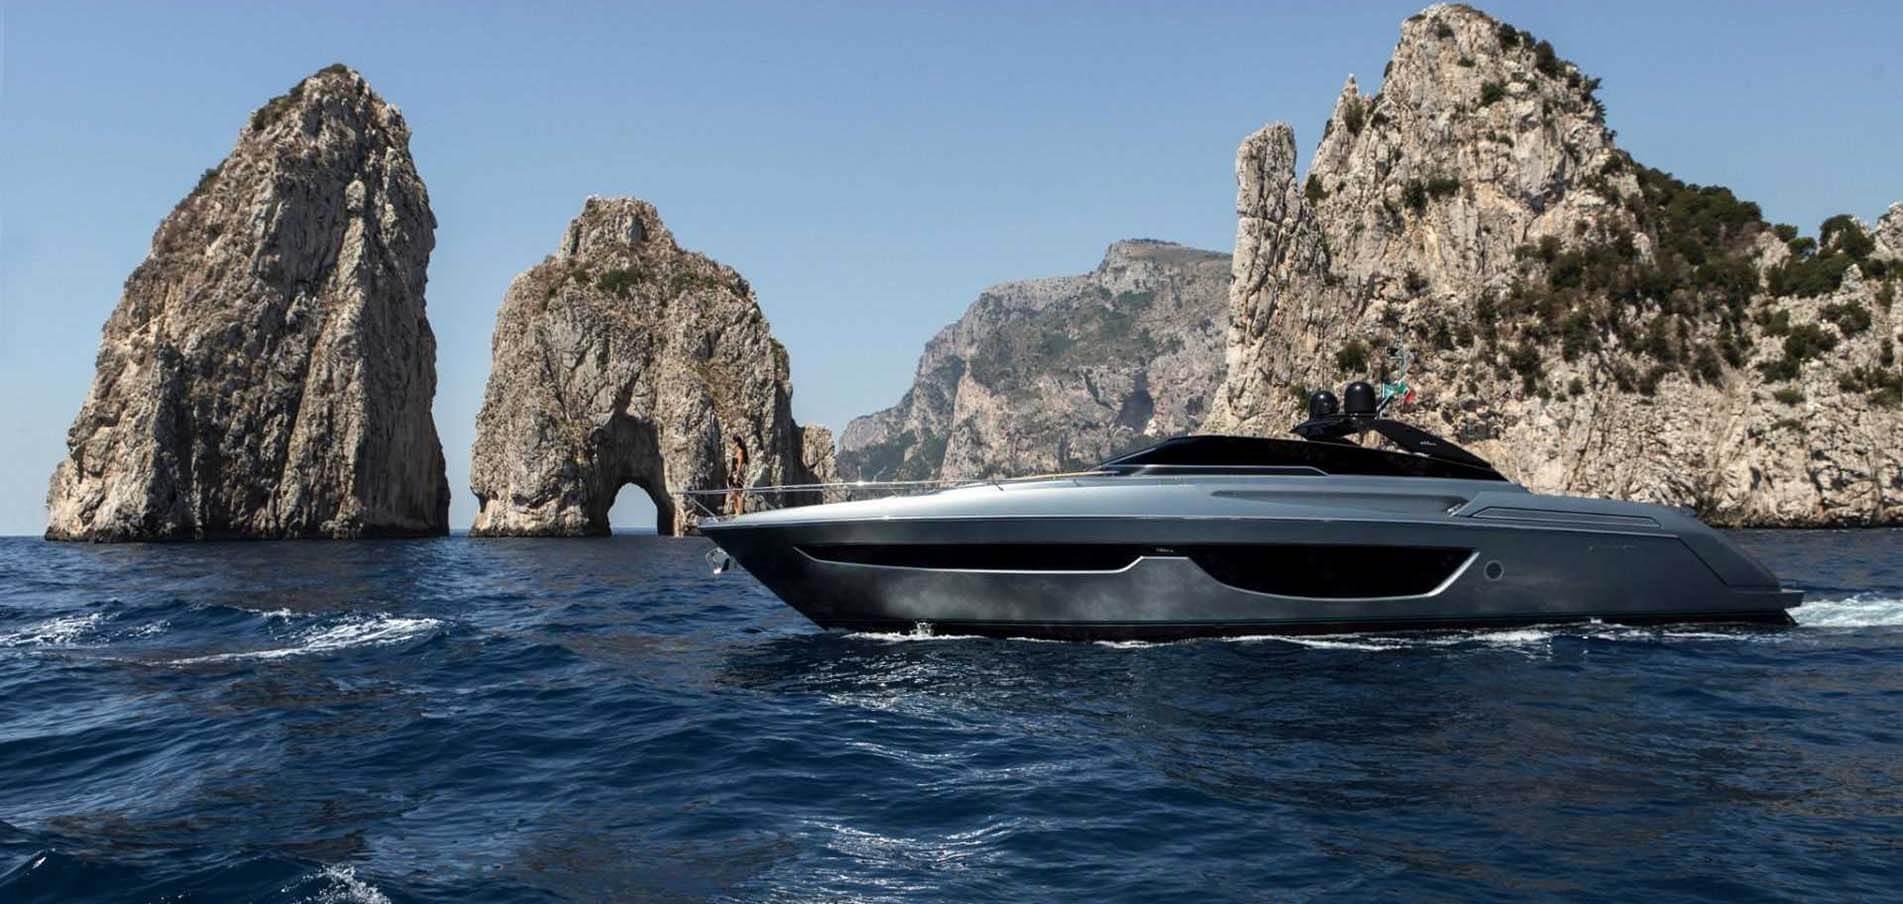 Location de yacht de luxe Italie